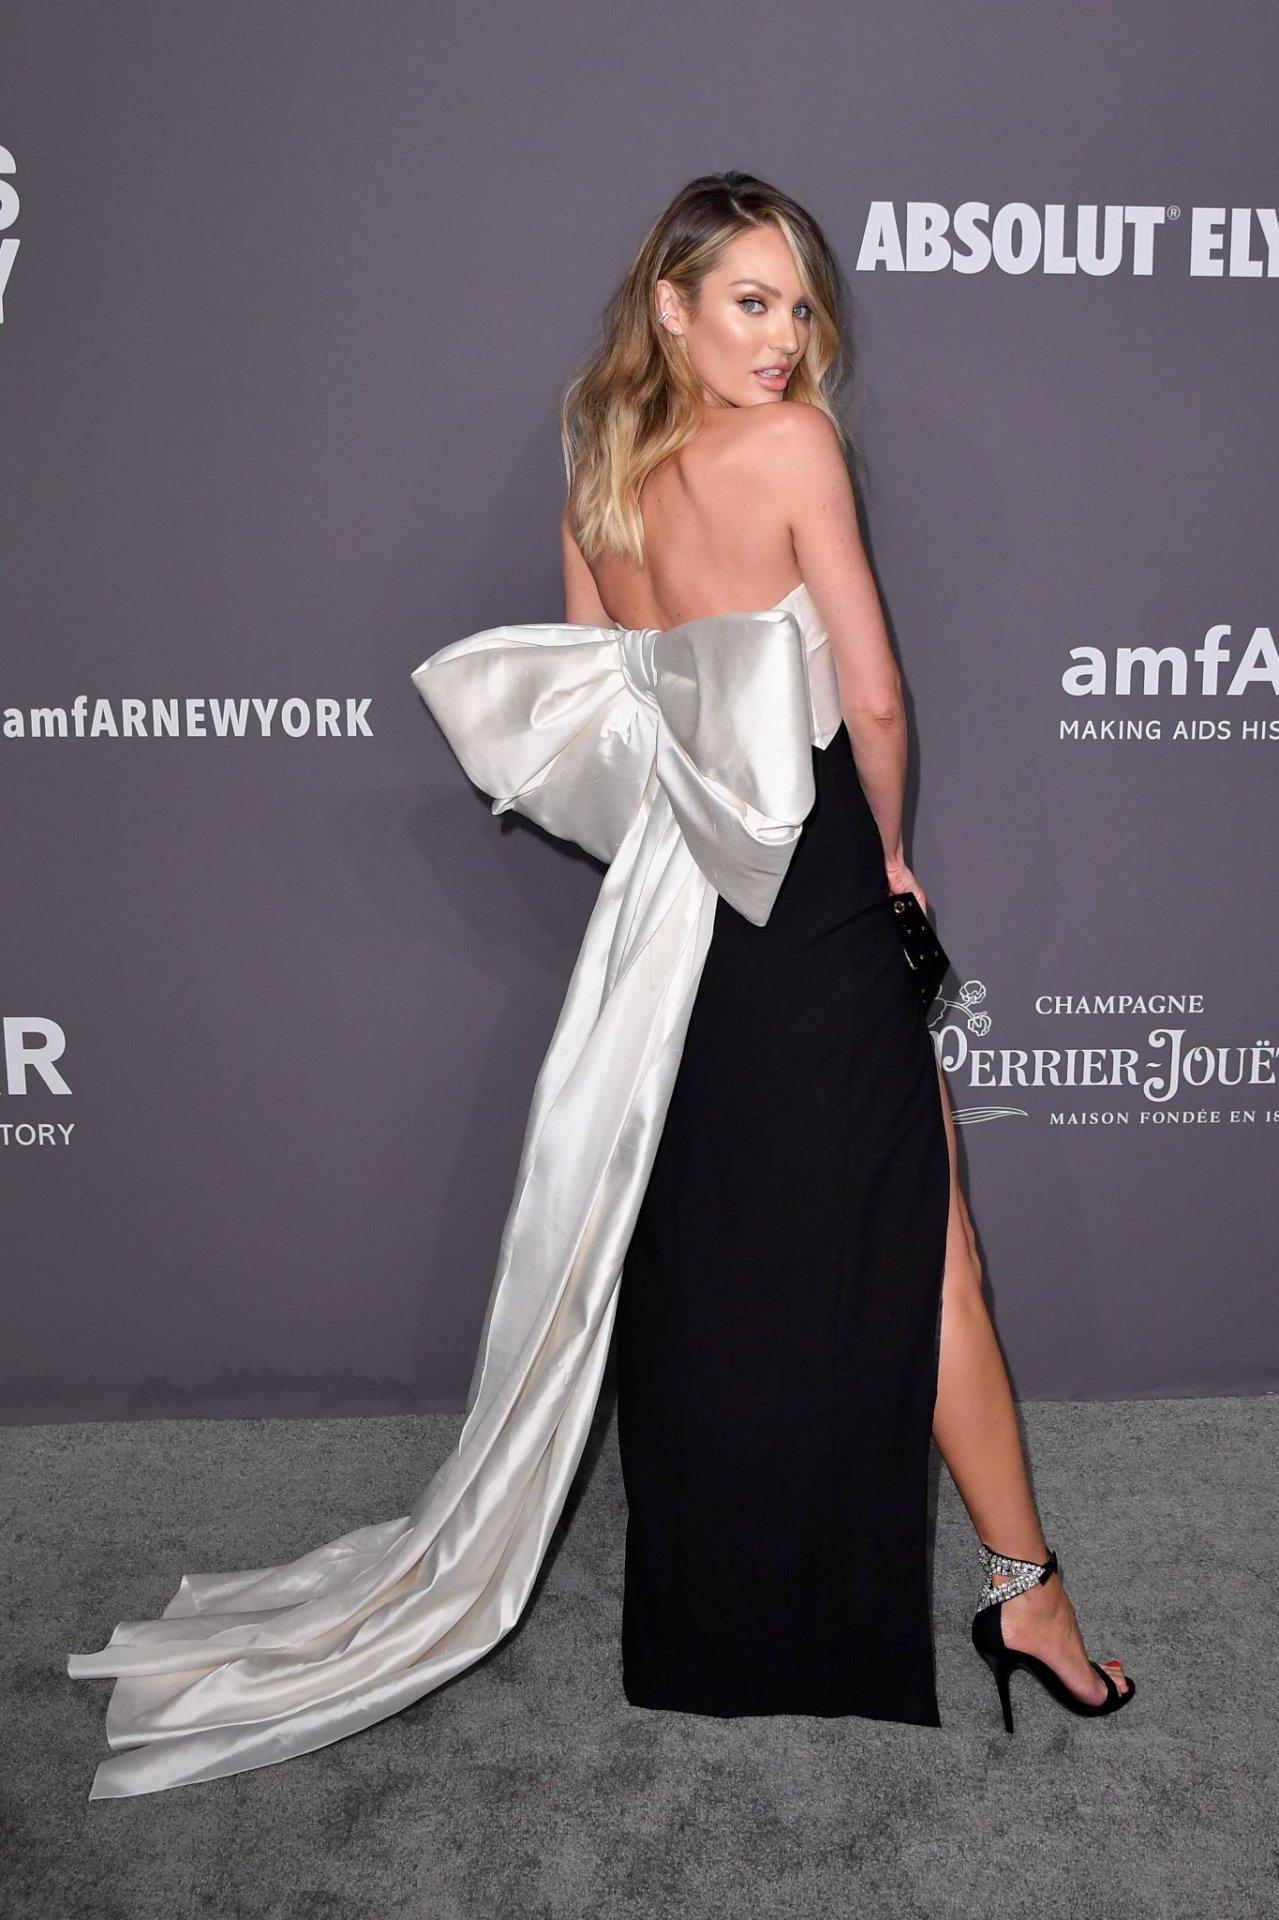 Candice Swanepoel Sexy Legs